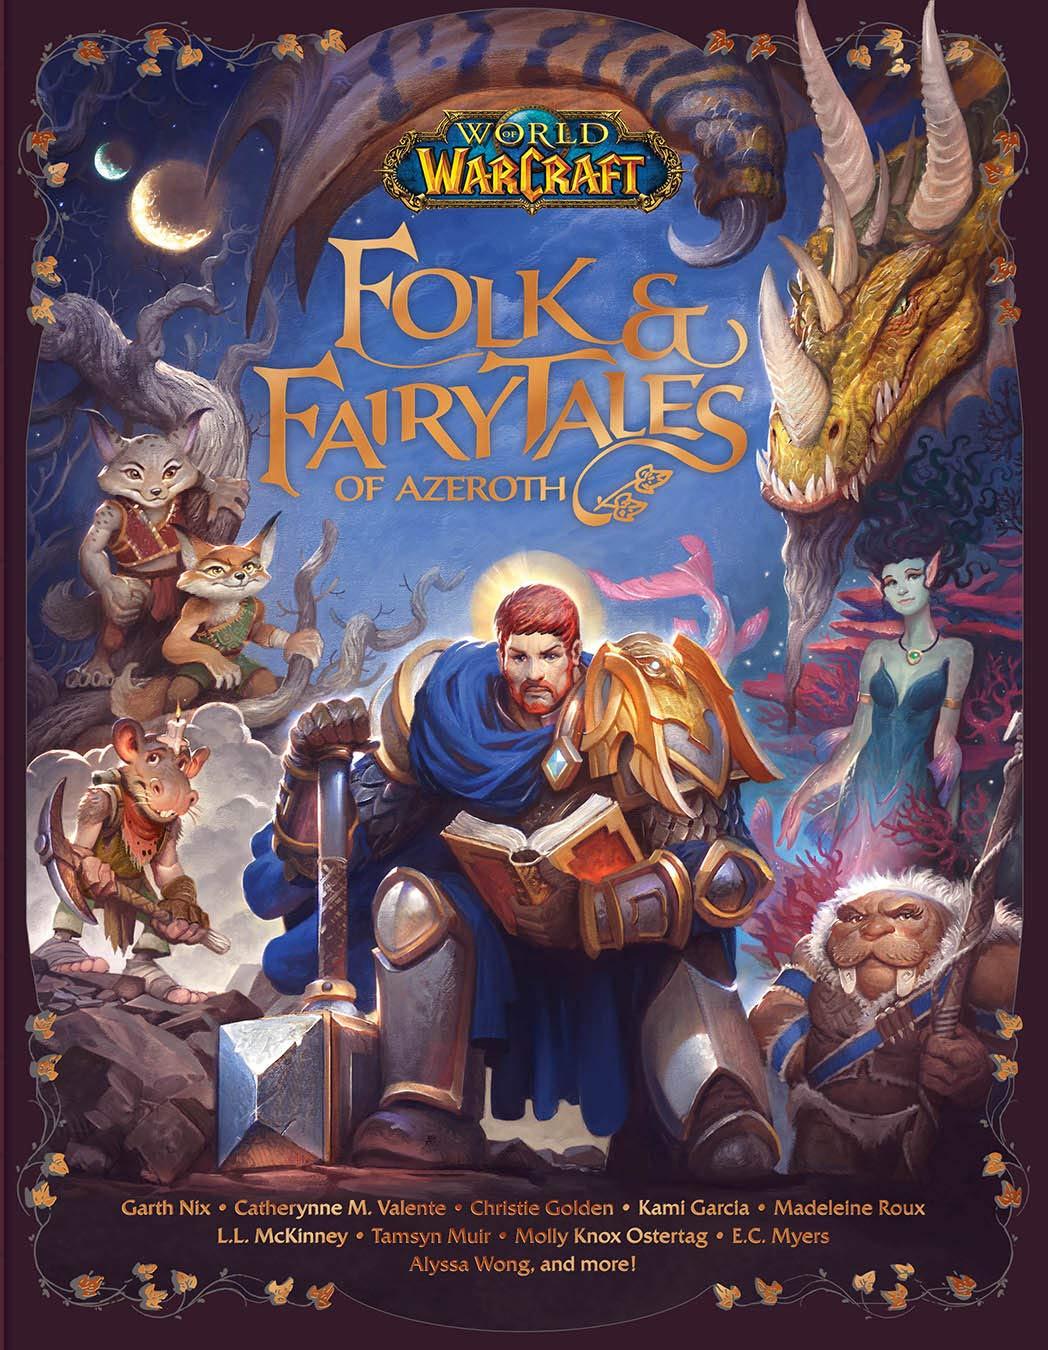 Kniha World of Warcraft: Folk & Fairy Tales of Azeroth